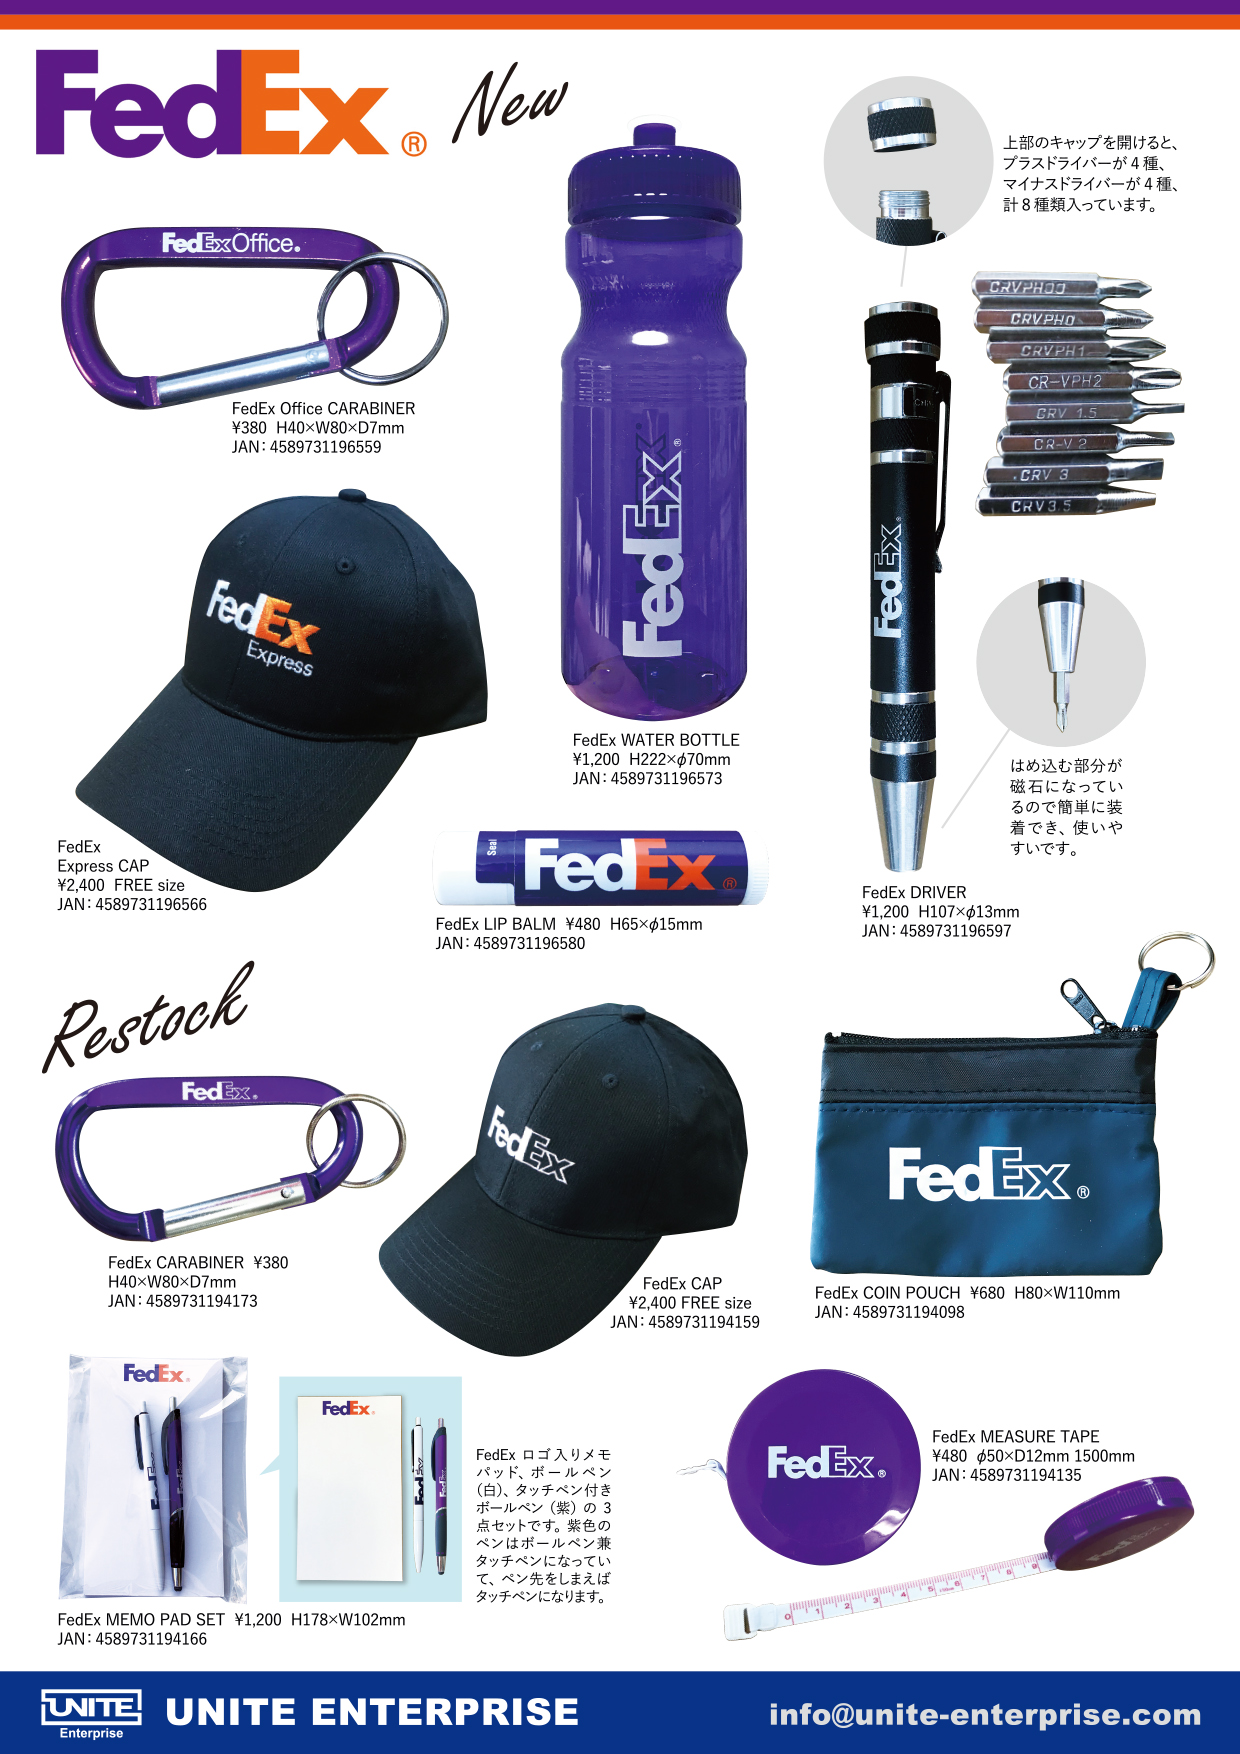 20191209_FedEx